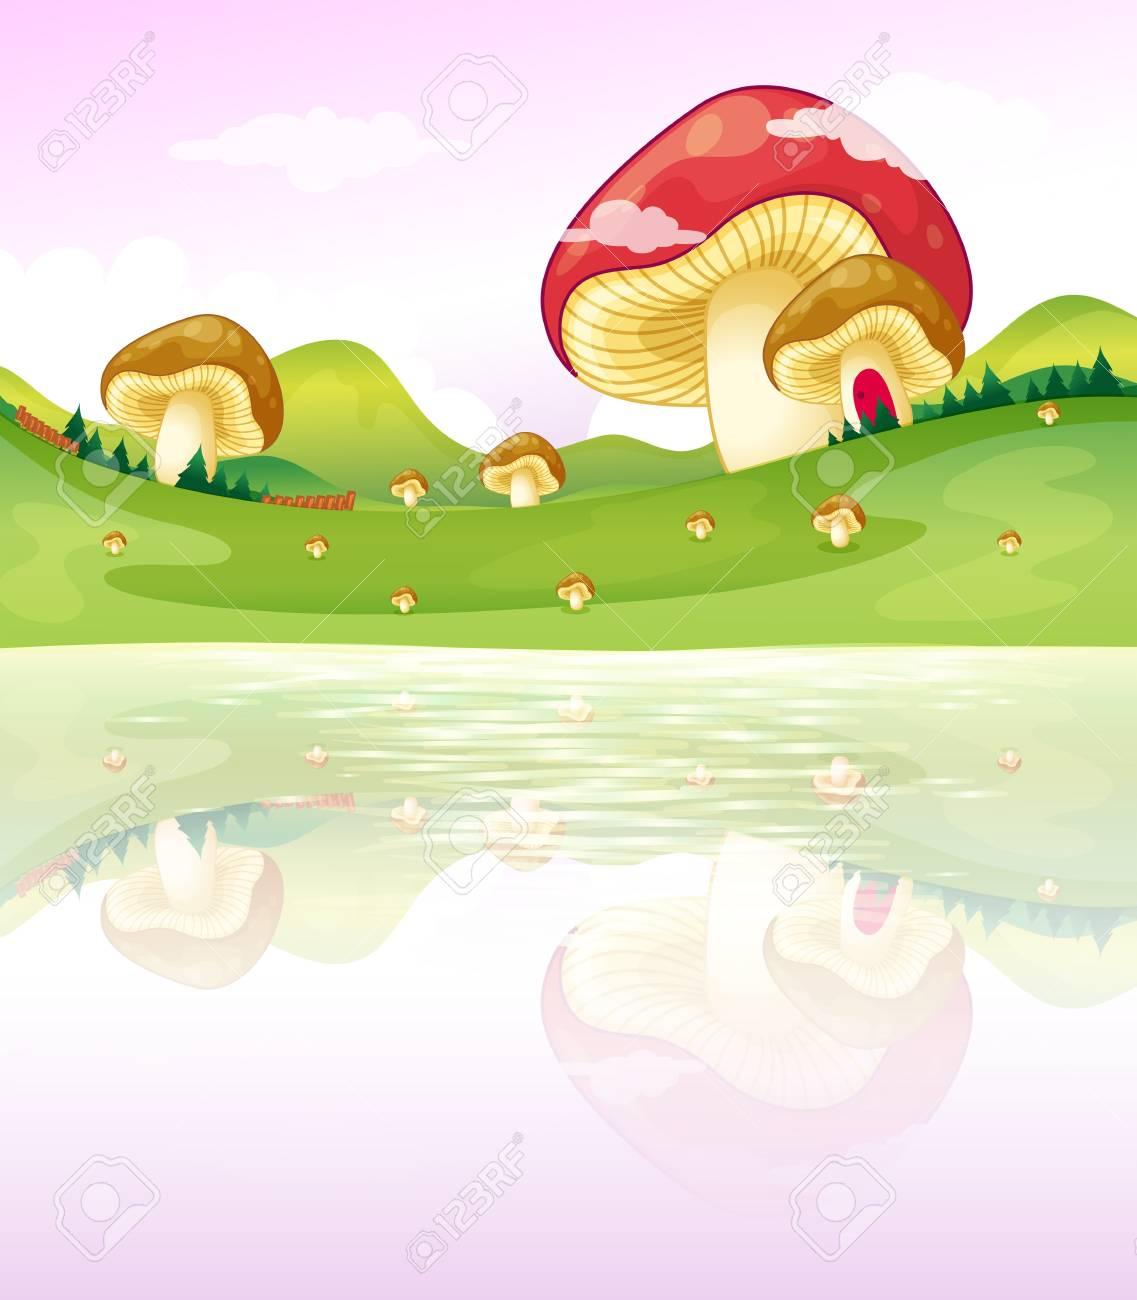 Illustration of the thmushrooms near the lake Stock Vector - 18053273